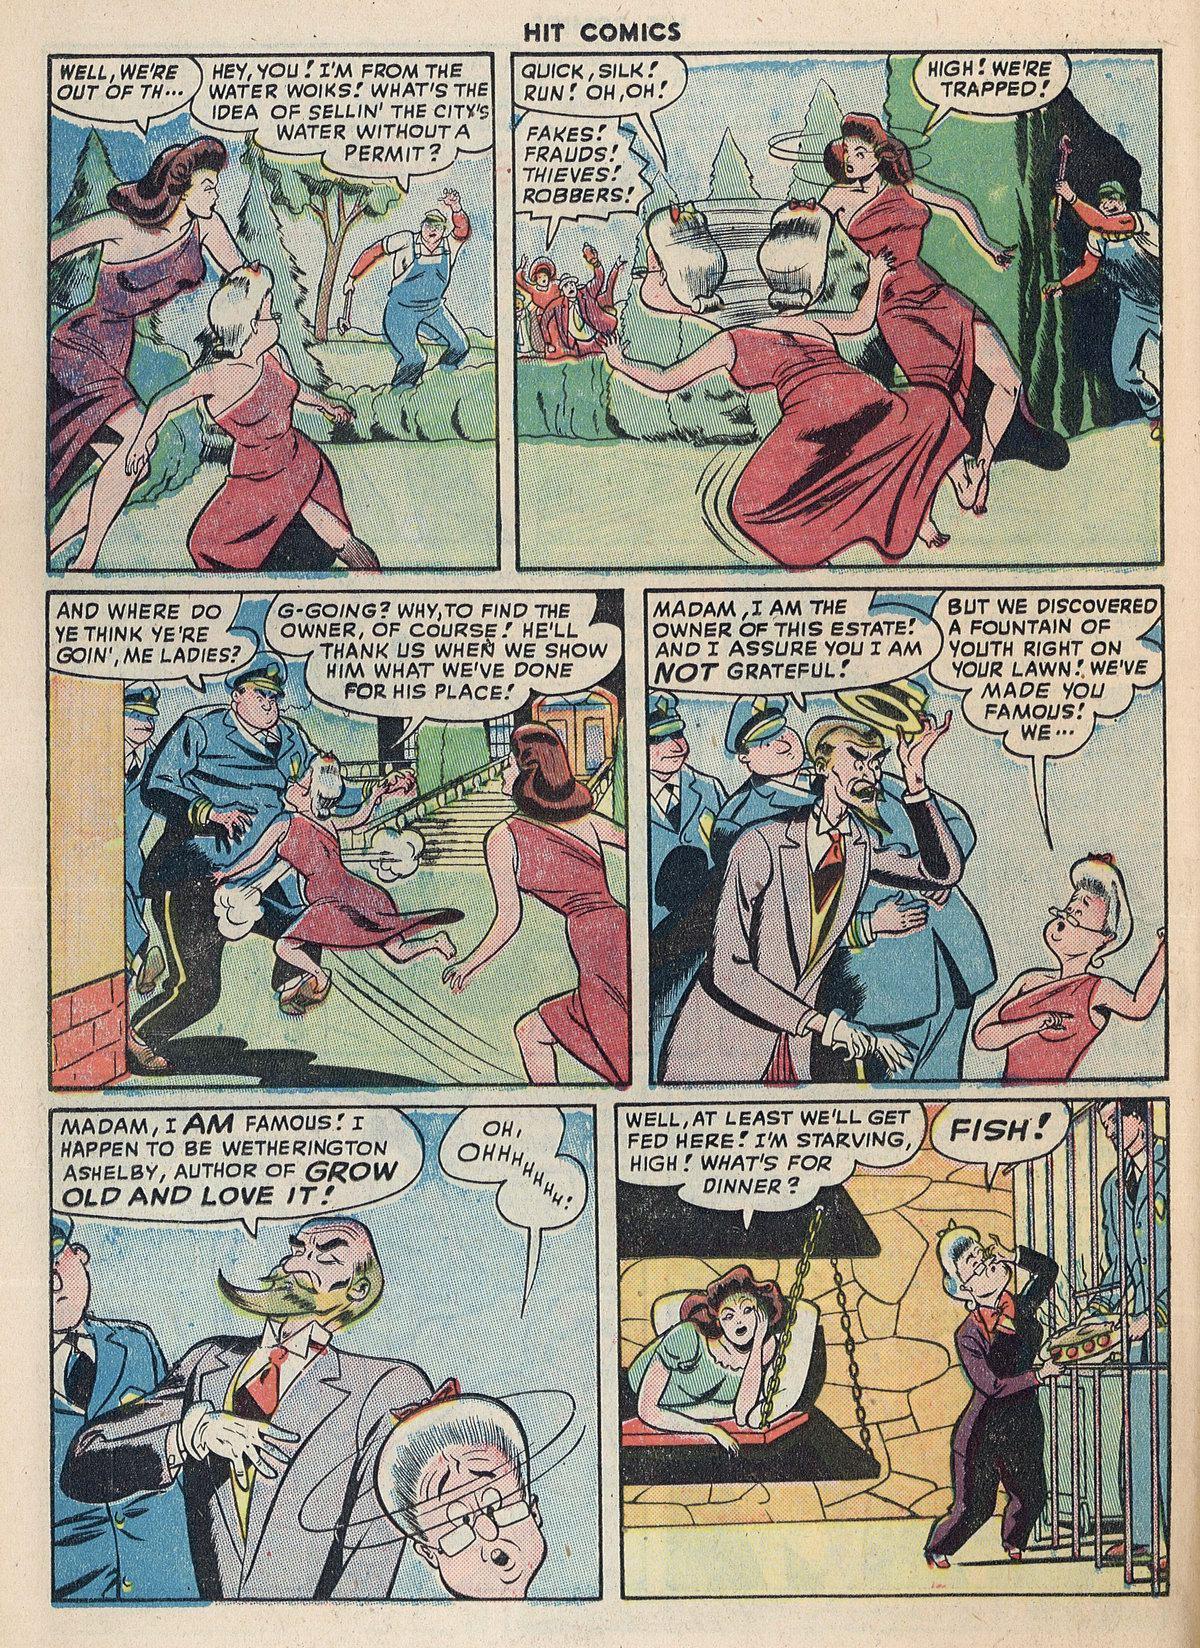 Read online Hit Comics comic -  Issue #55 - 20